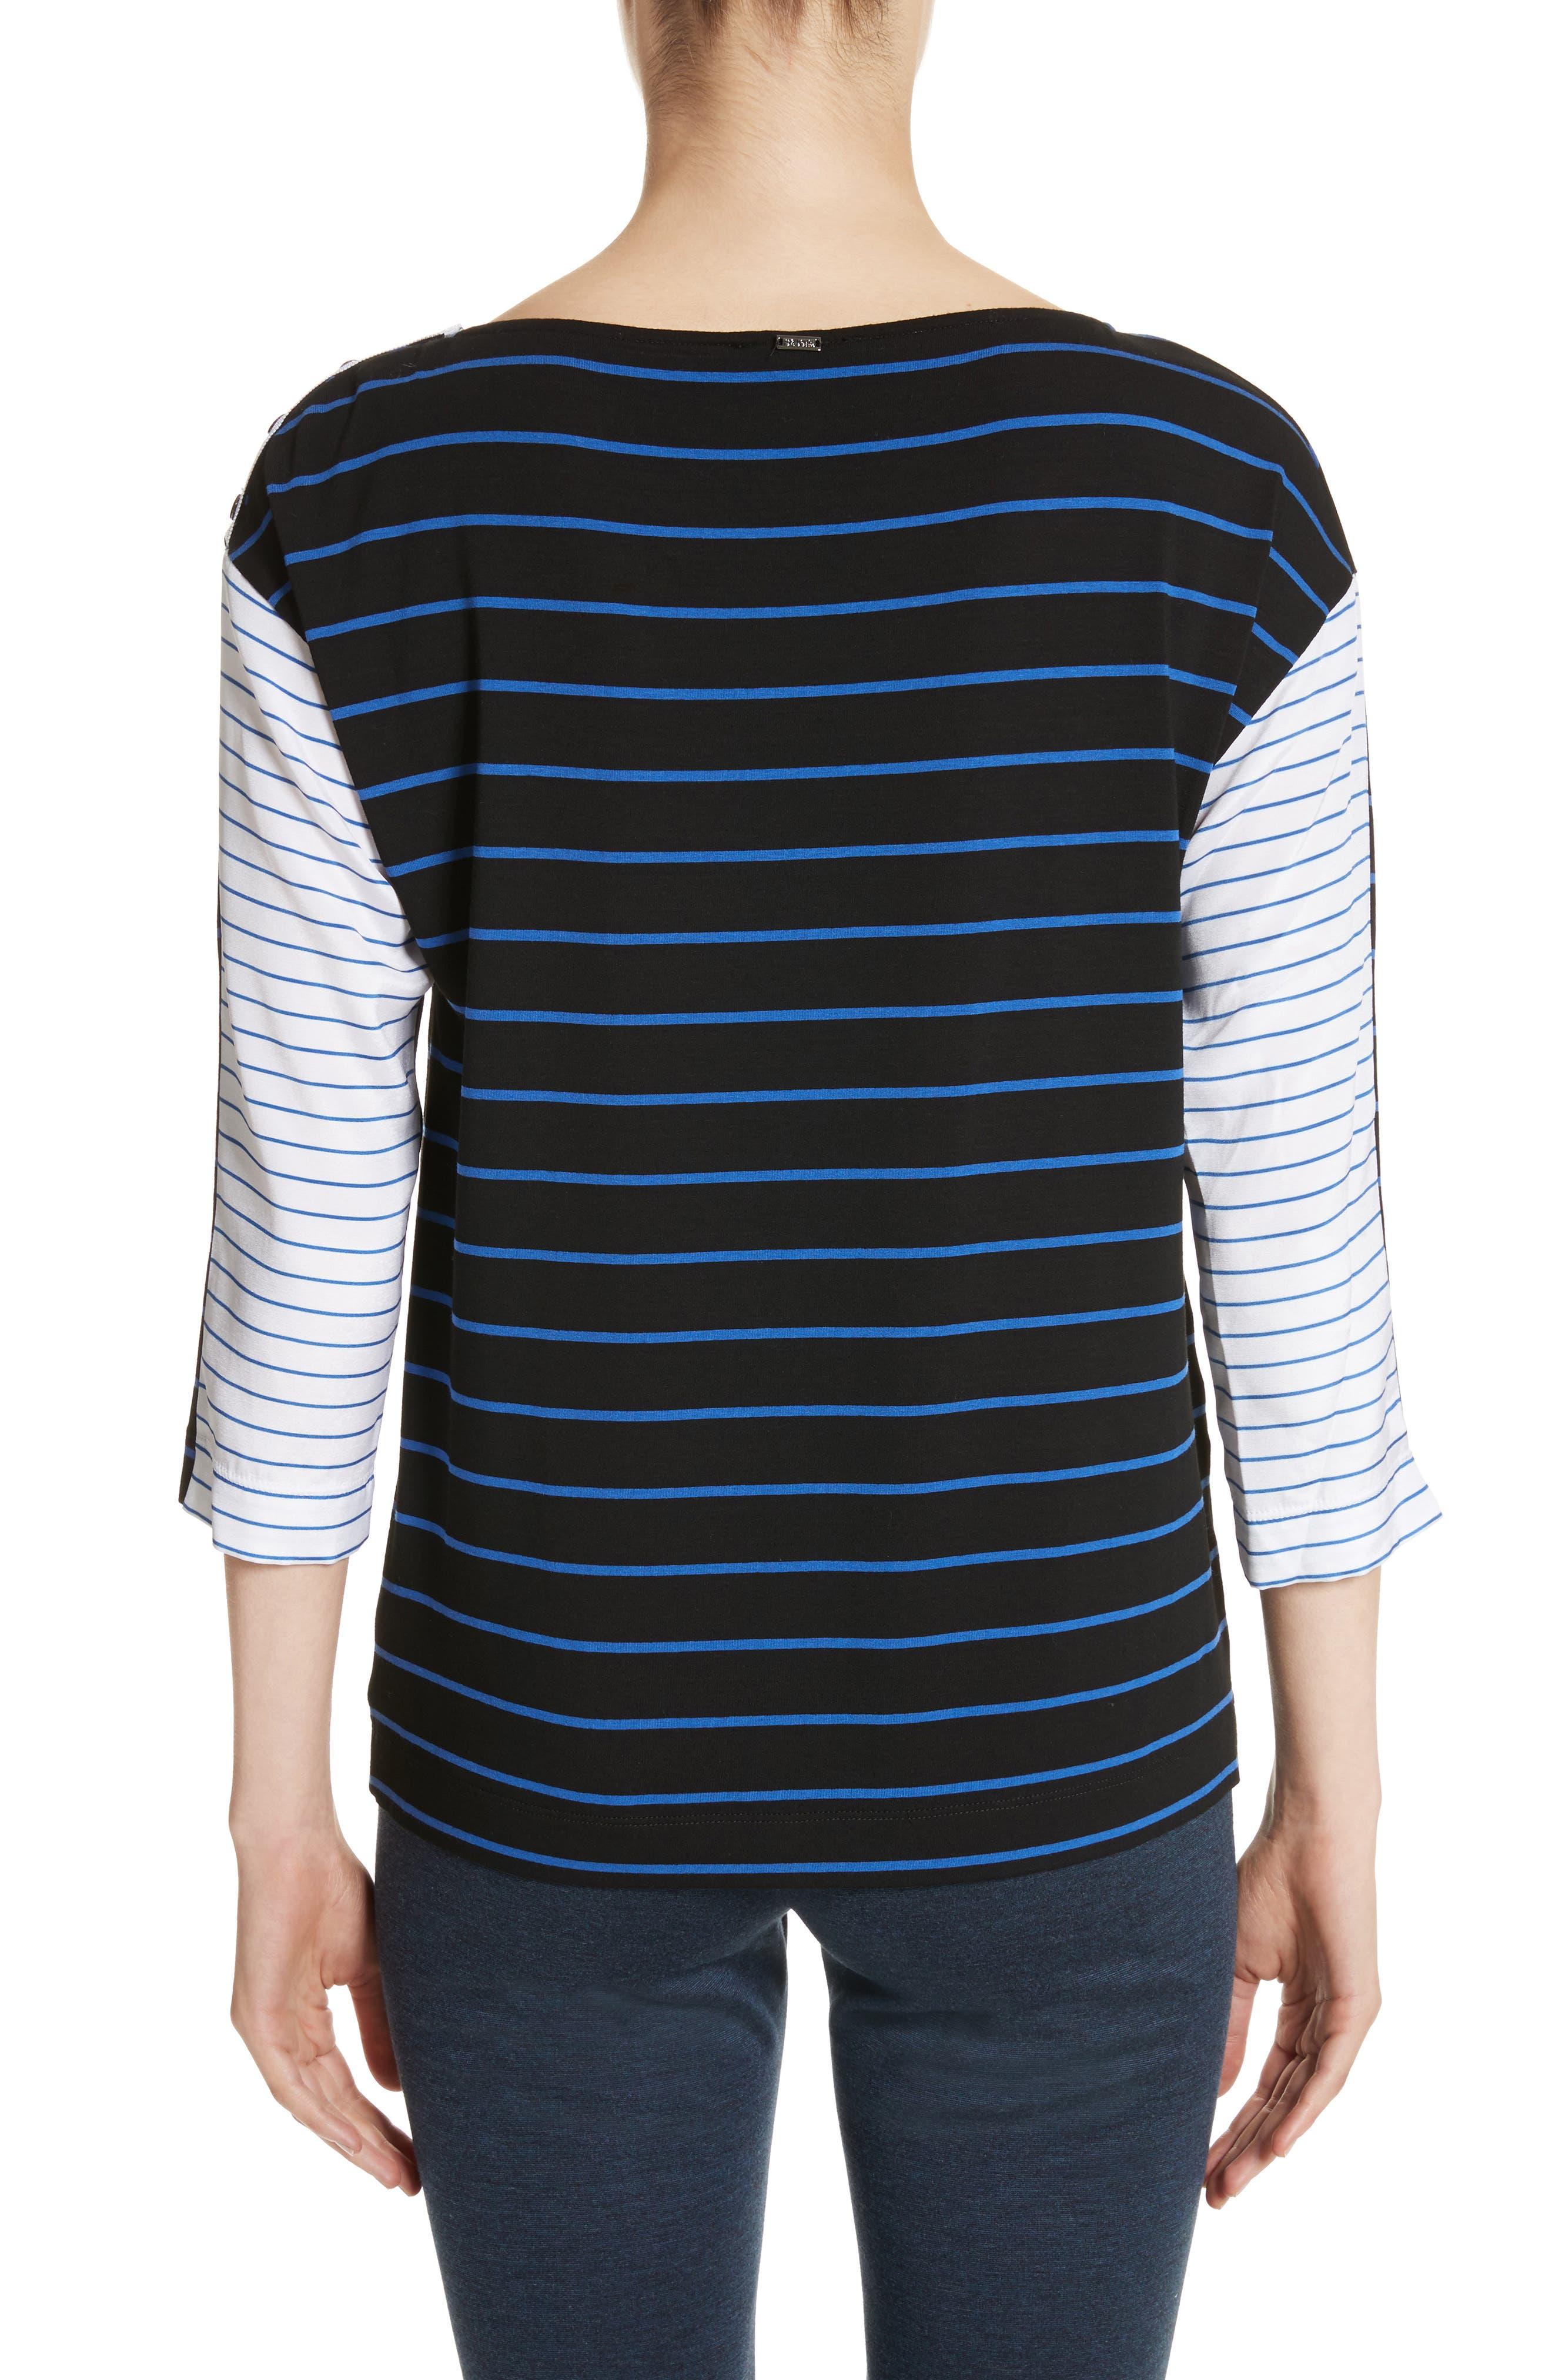 Alternate Image 2  - St. John Collection Yarn Dyed Stripe Jersey Top